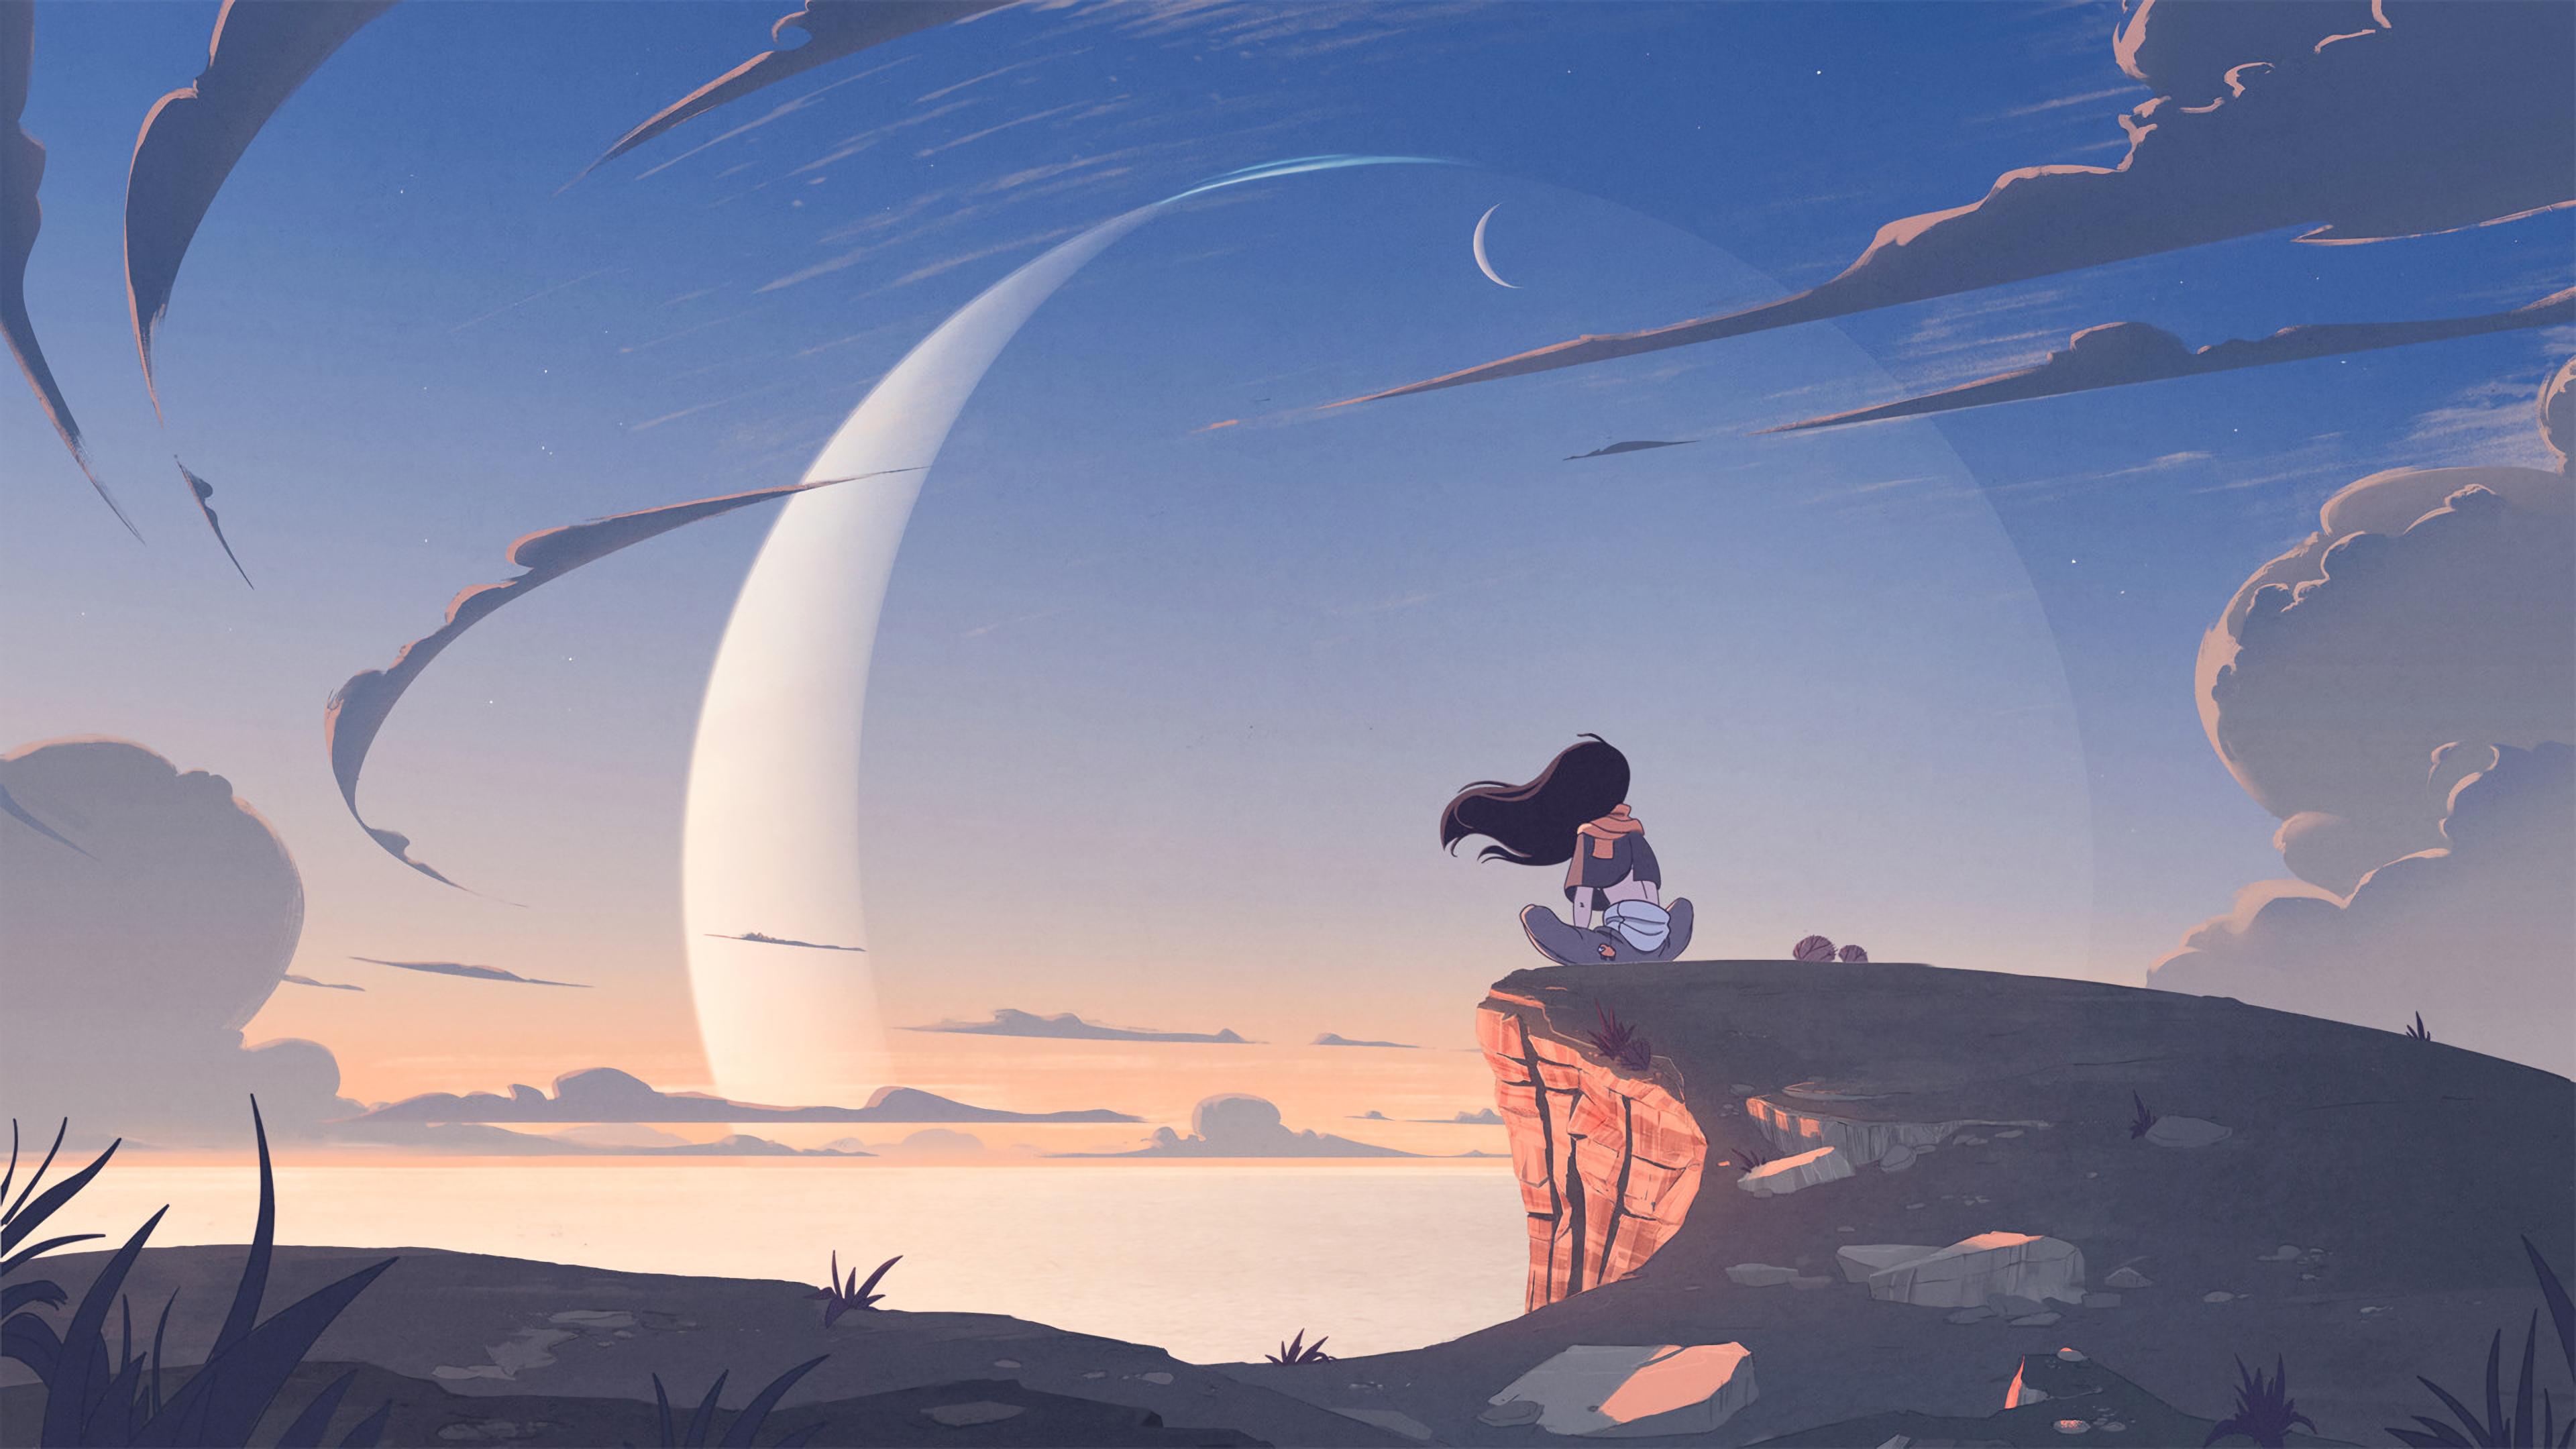 anime girl alone at mountain cliff 1578253911 - Anime Girl Alone At Mountain Cliff -